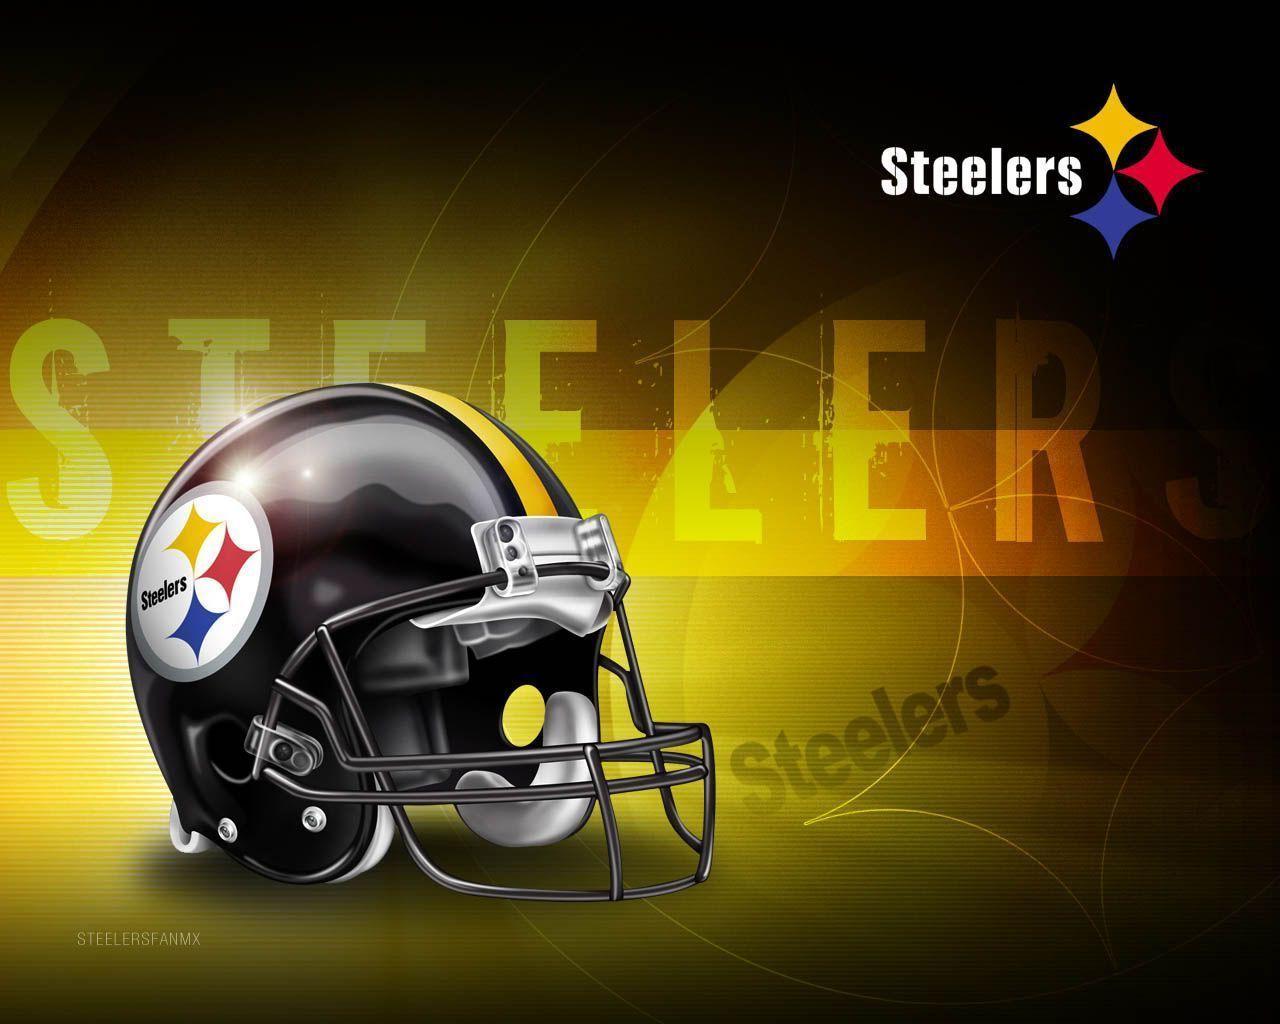 3d Steelers Live Wallpaper Steelers Wallpapers Wallpaper Cave